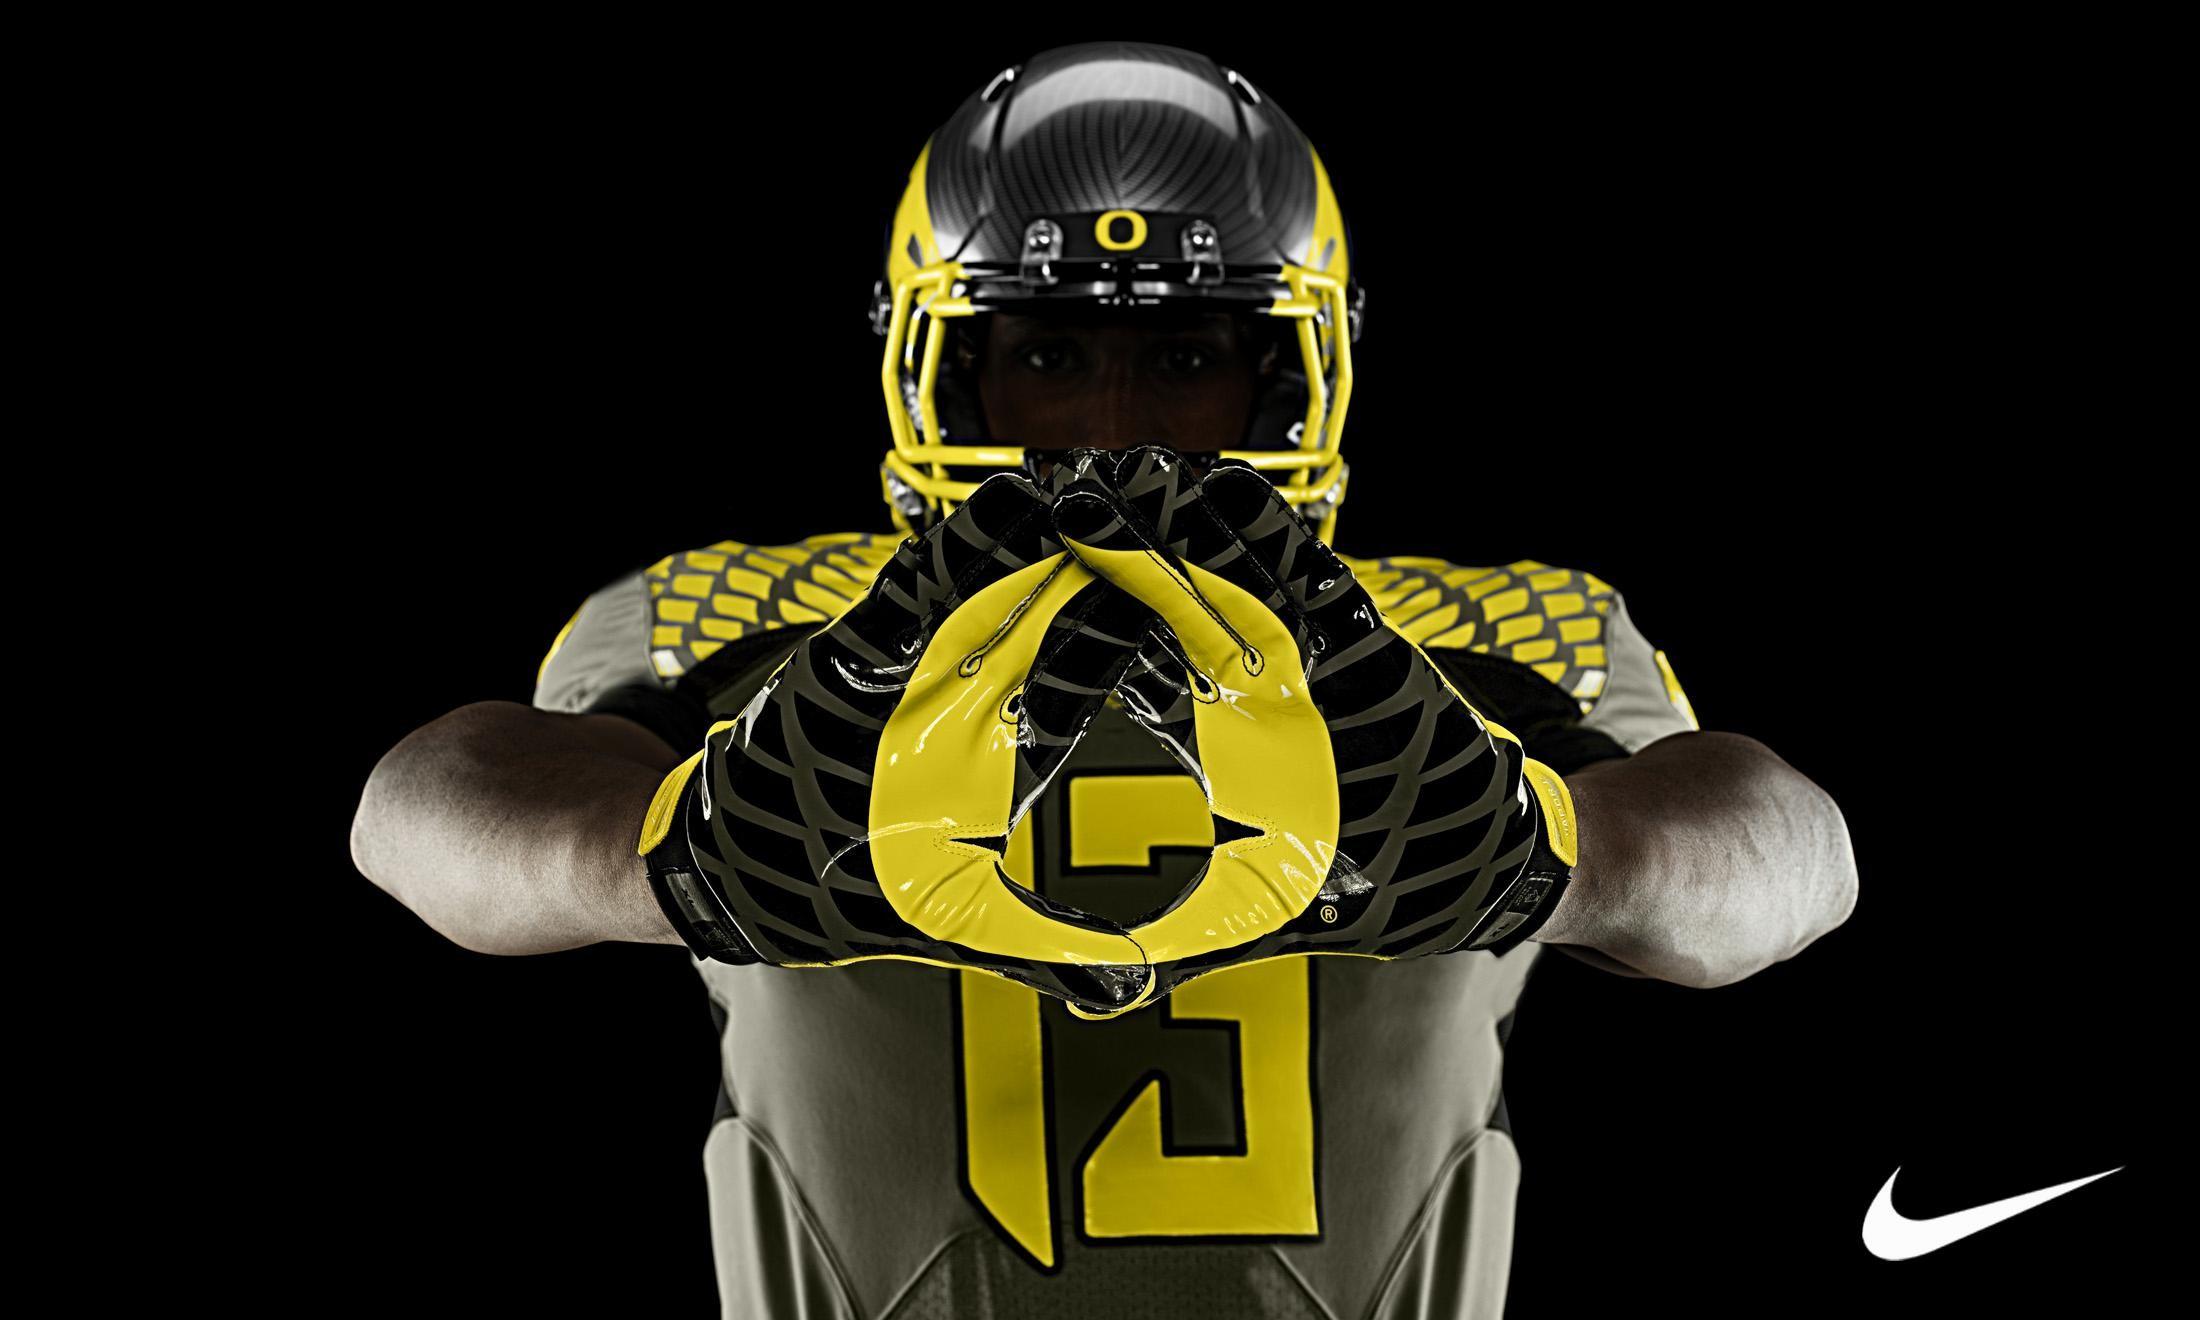 wallpaper.wiki-Oregon-college-football-2200×1320-px-PIC-